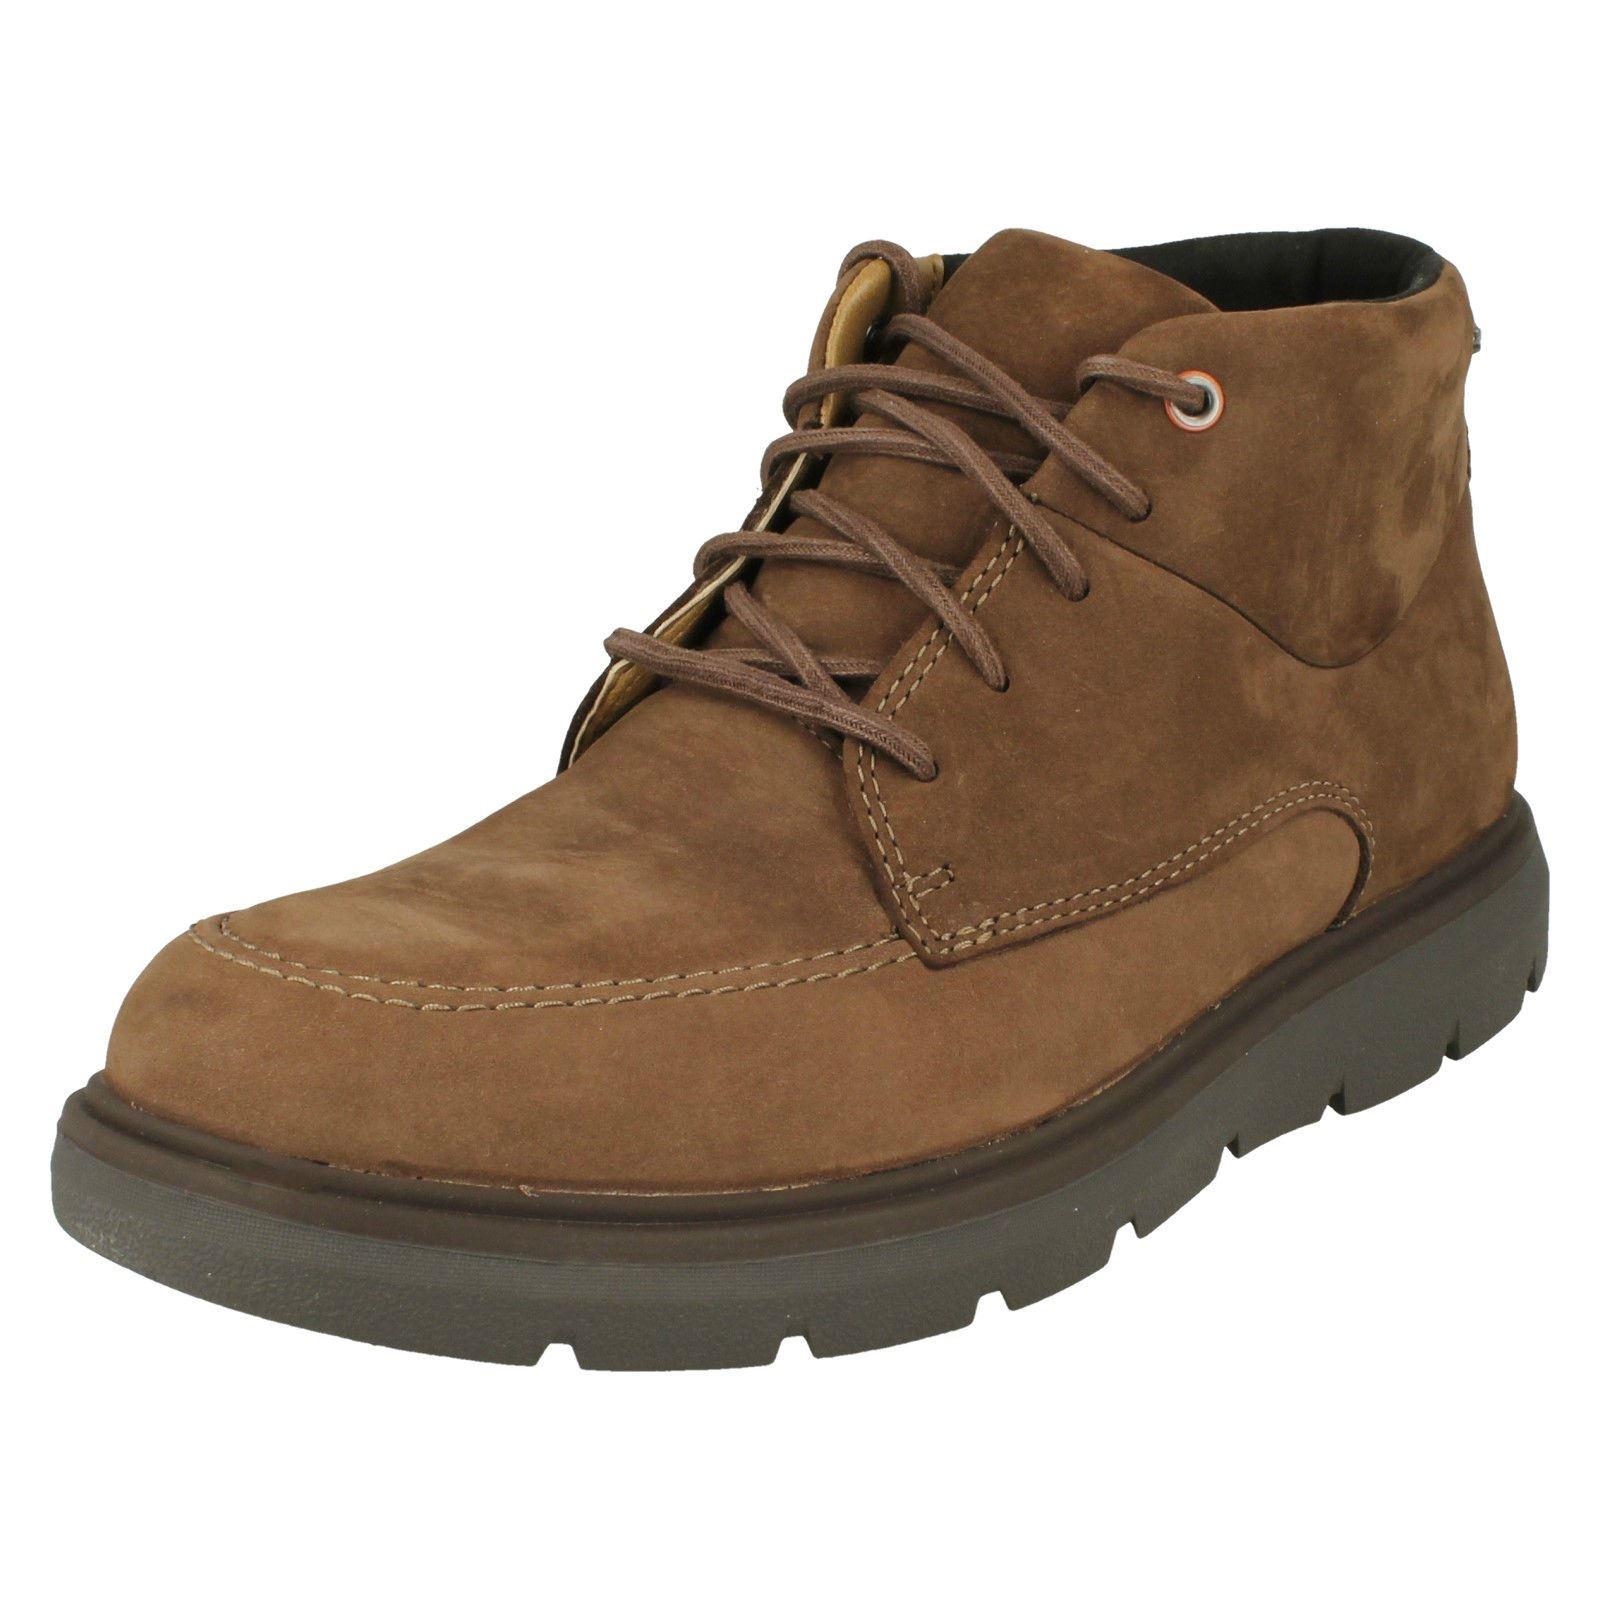 CLARKS Un Map Mid GTX Mens Ankle Boots